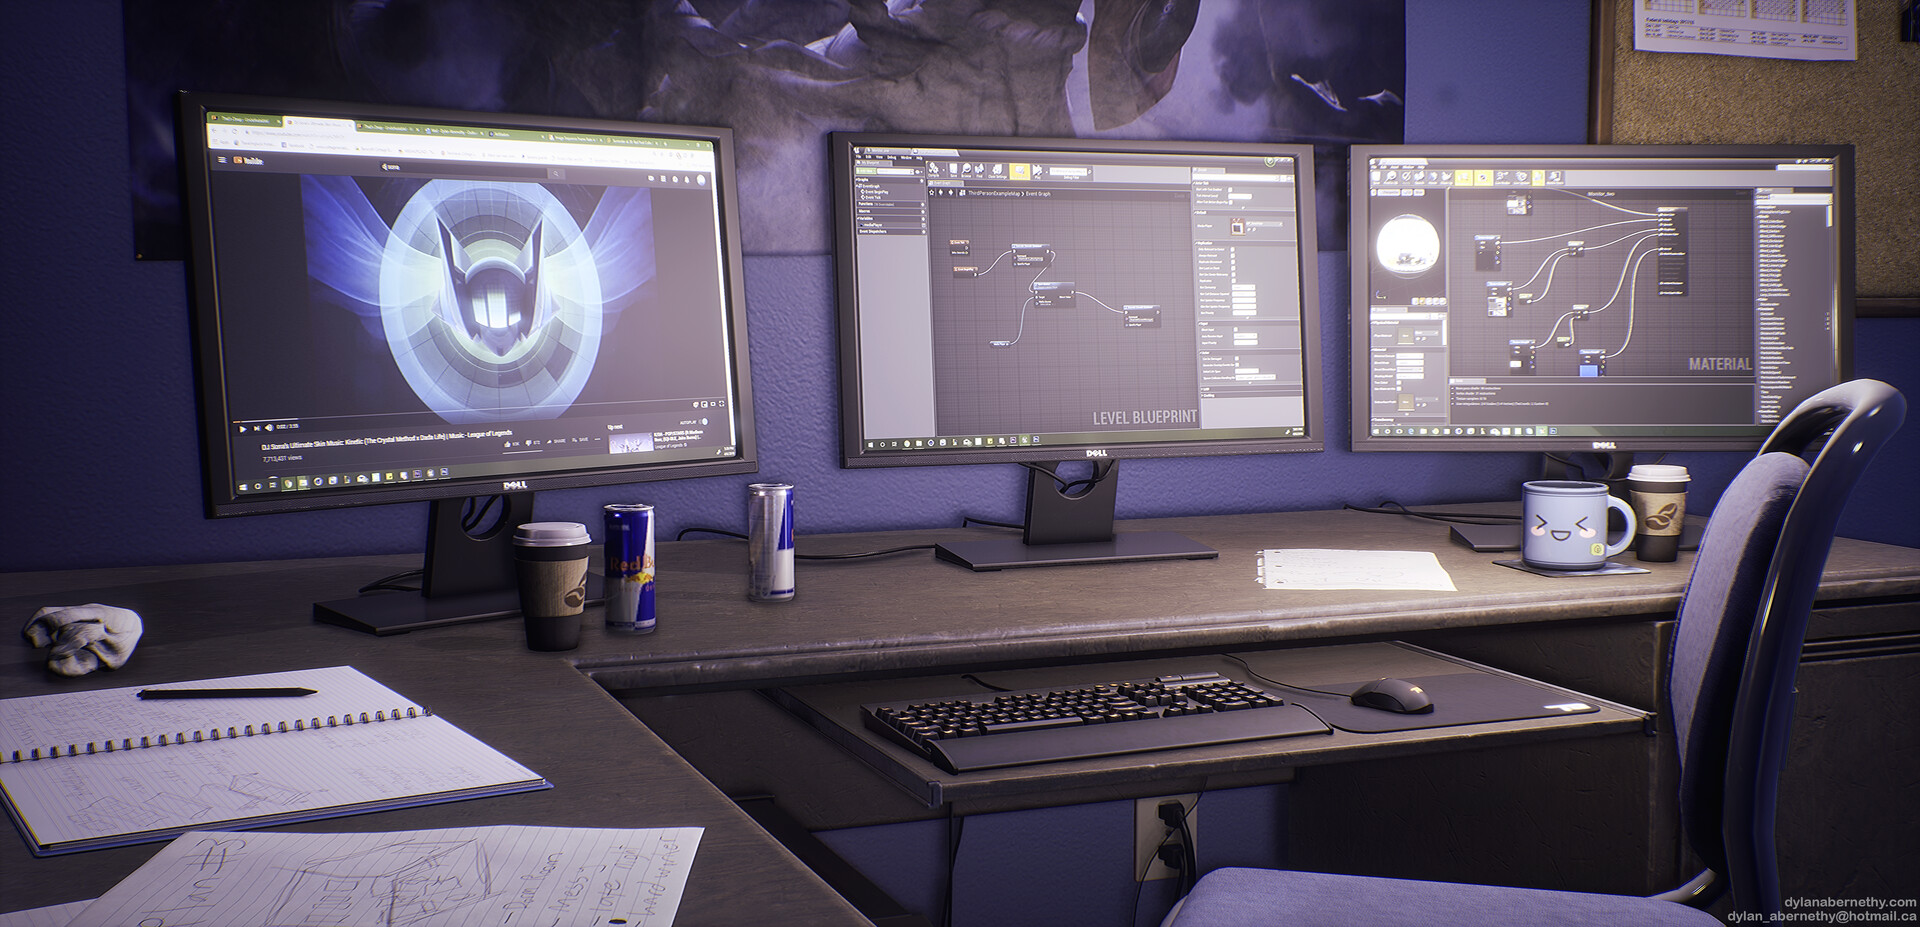 View of Monitors